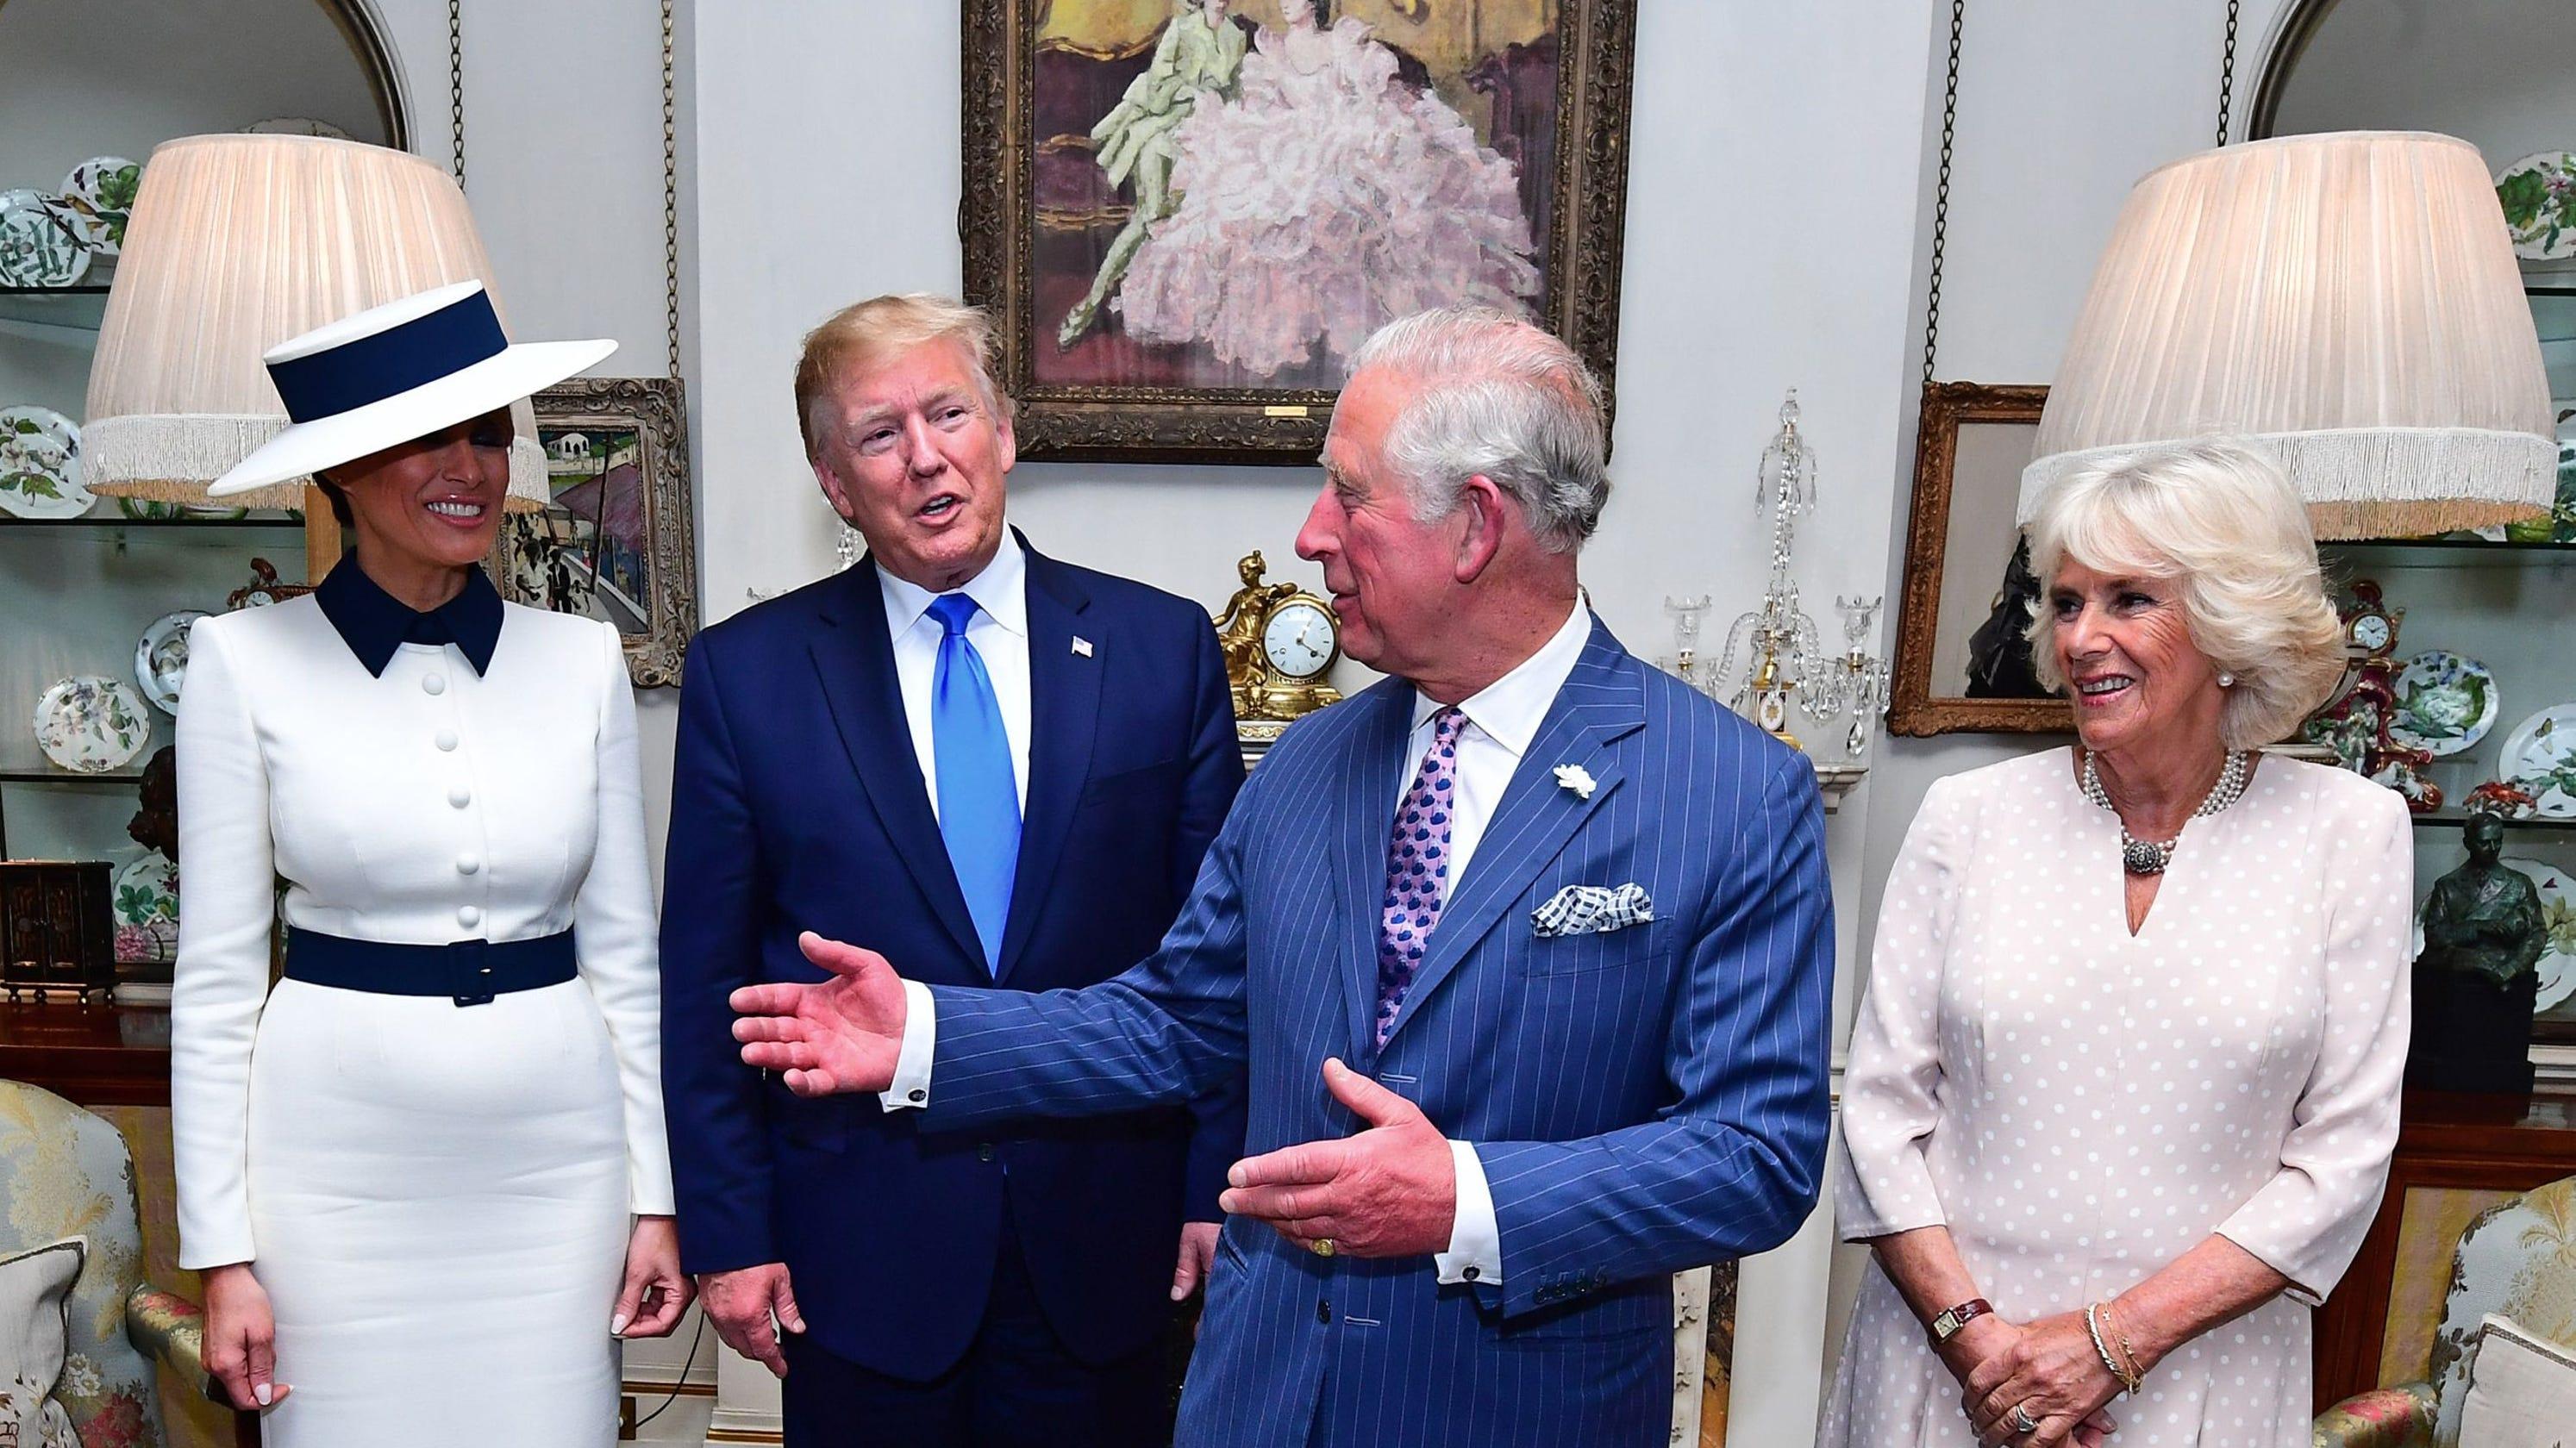 c0d29180 Trump, Melania, Prince Charles, Camilla have tea: What fell on floor?